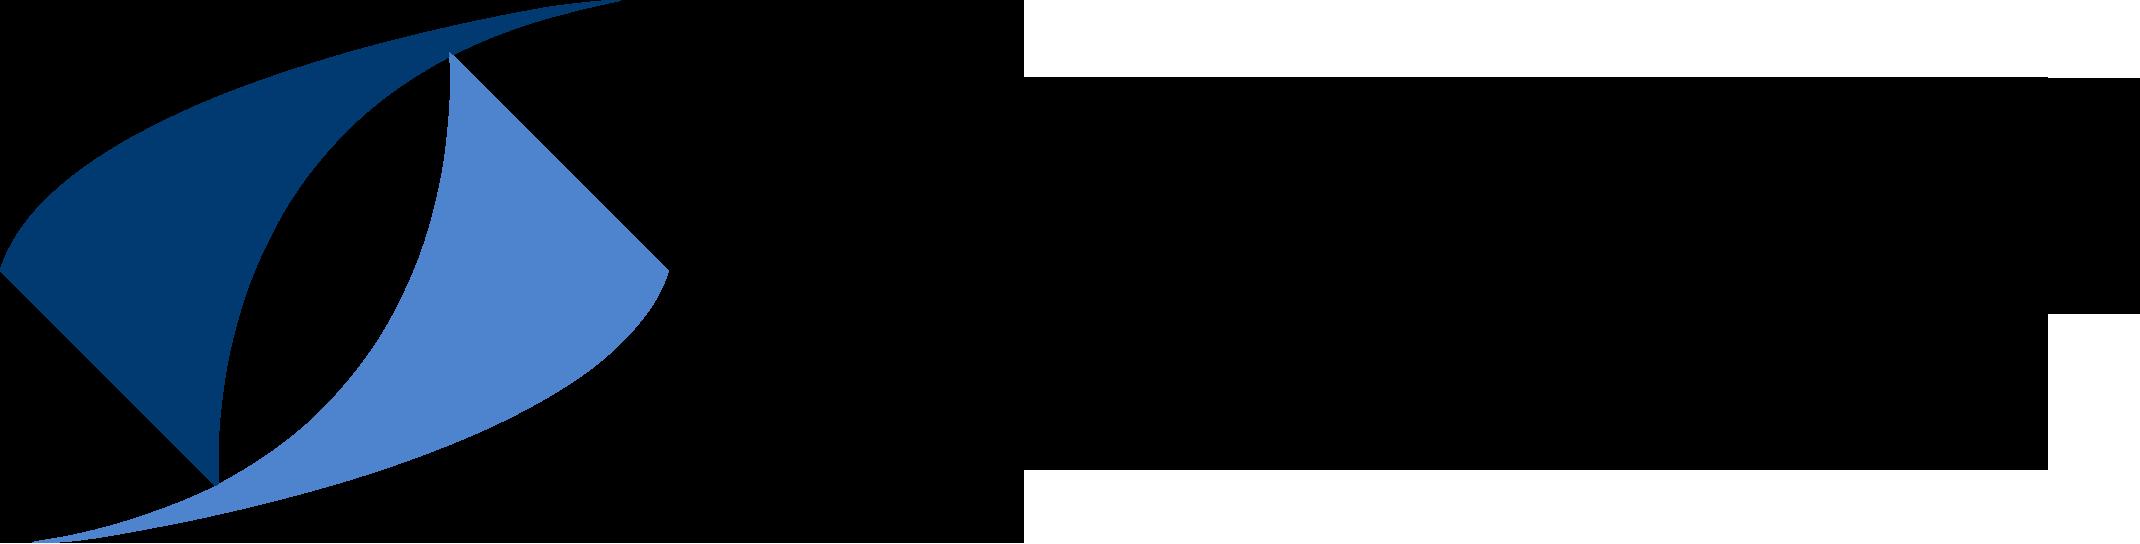 Acopia Capital Group